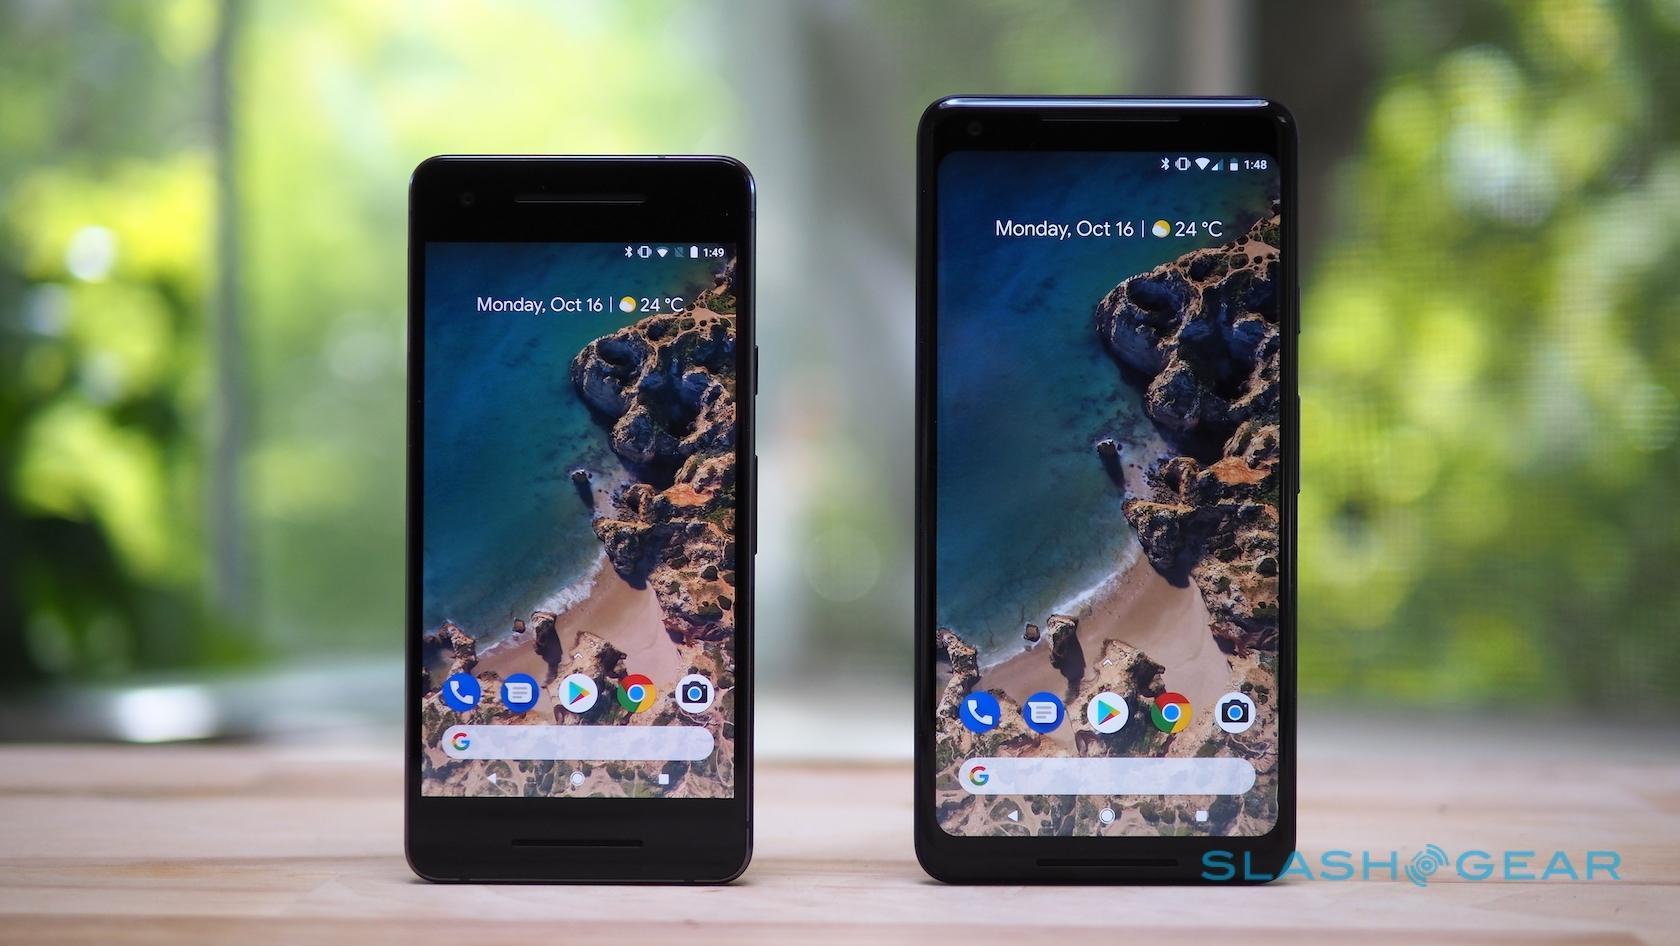 Google has stopped Pixel 2 sales